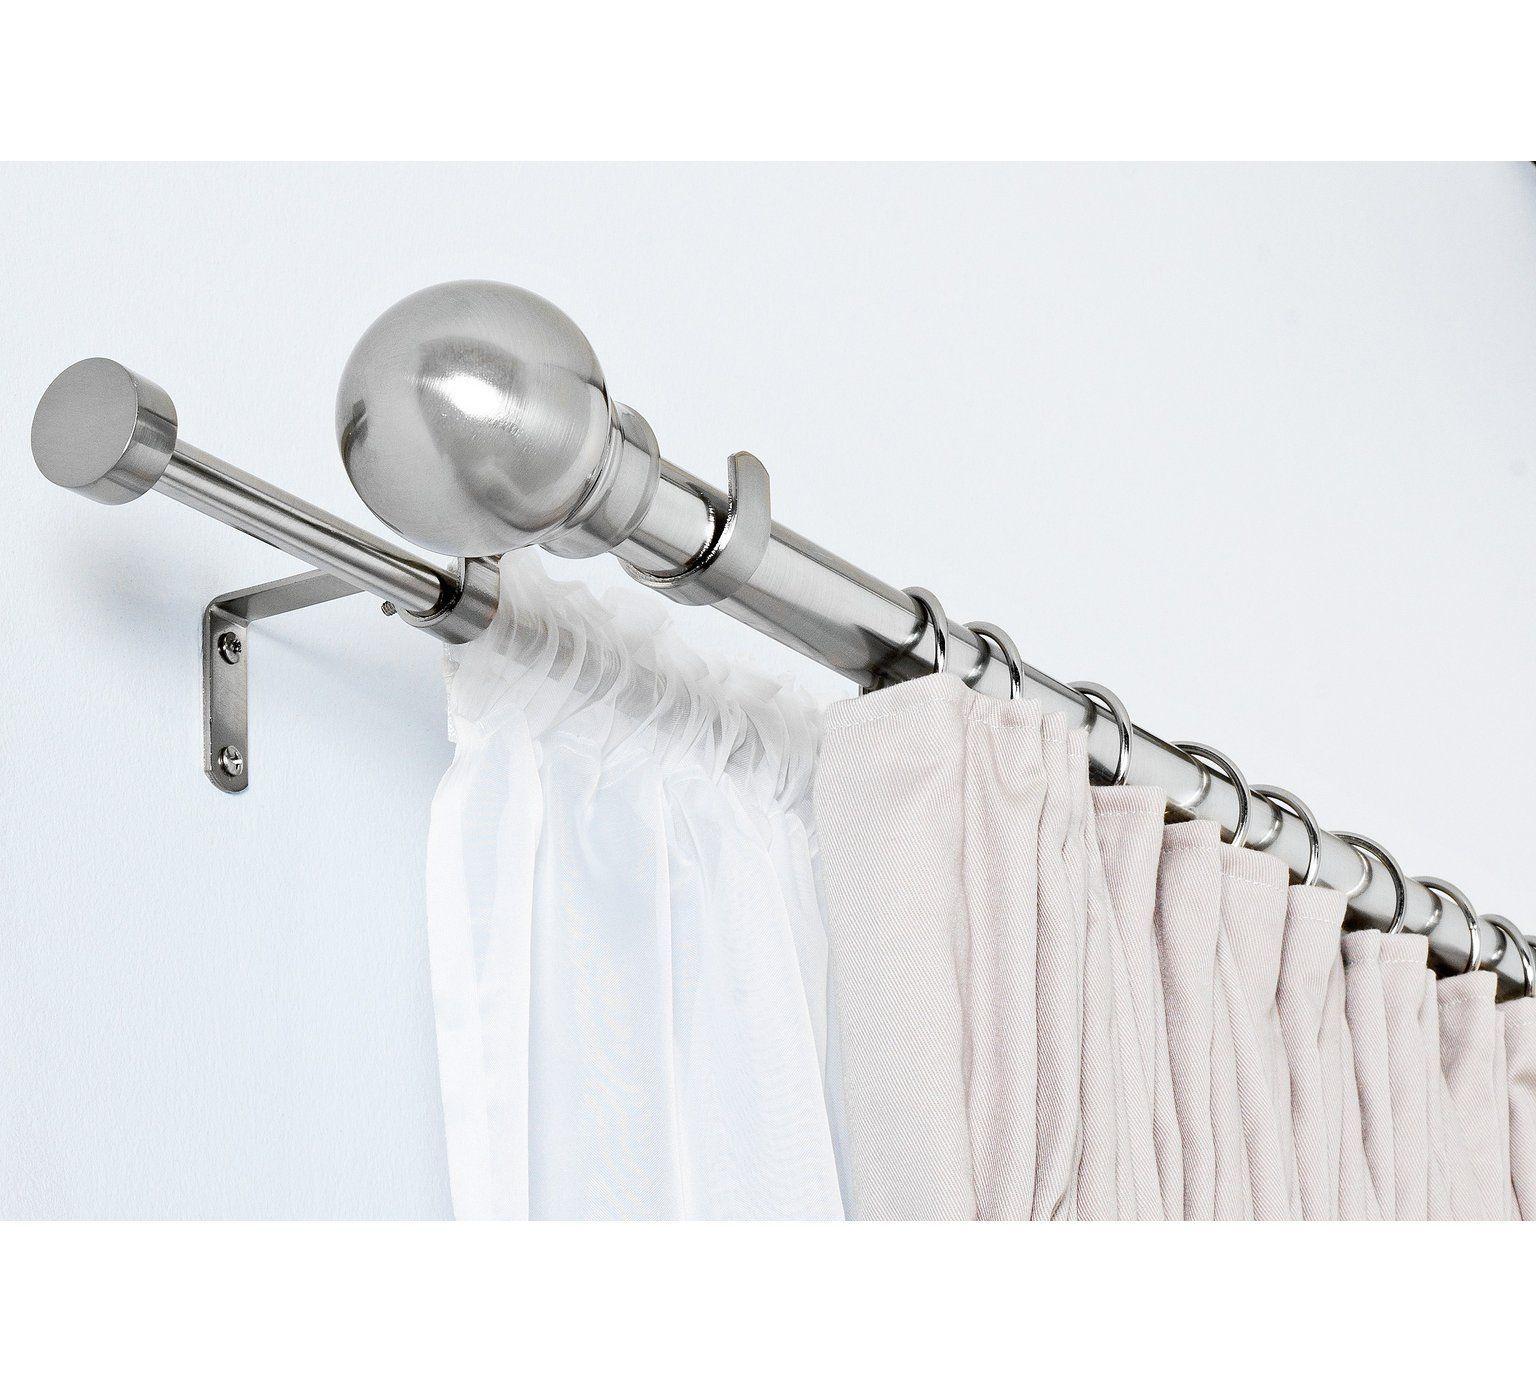 Buy Argos Home Extendable Double Curtain Voile Pole S Steel